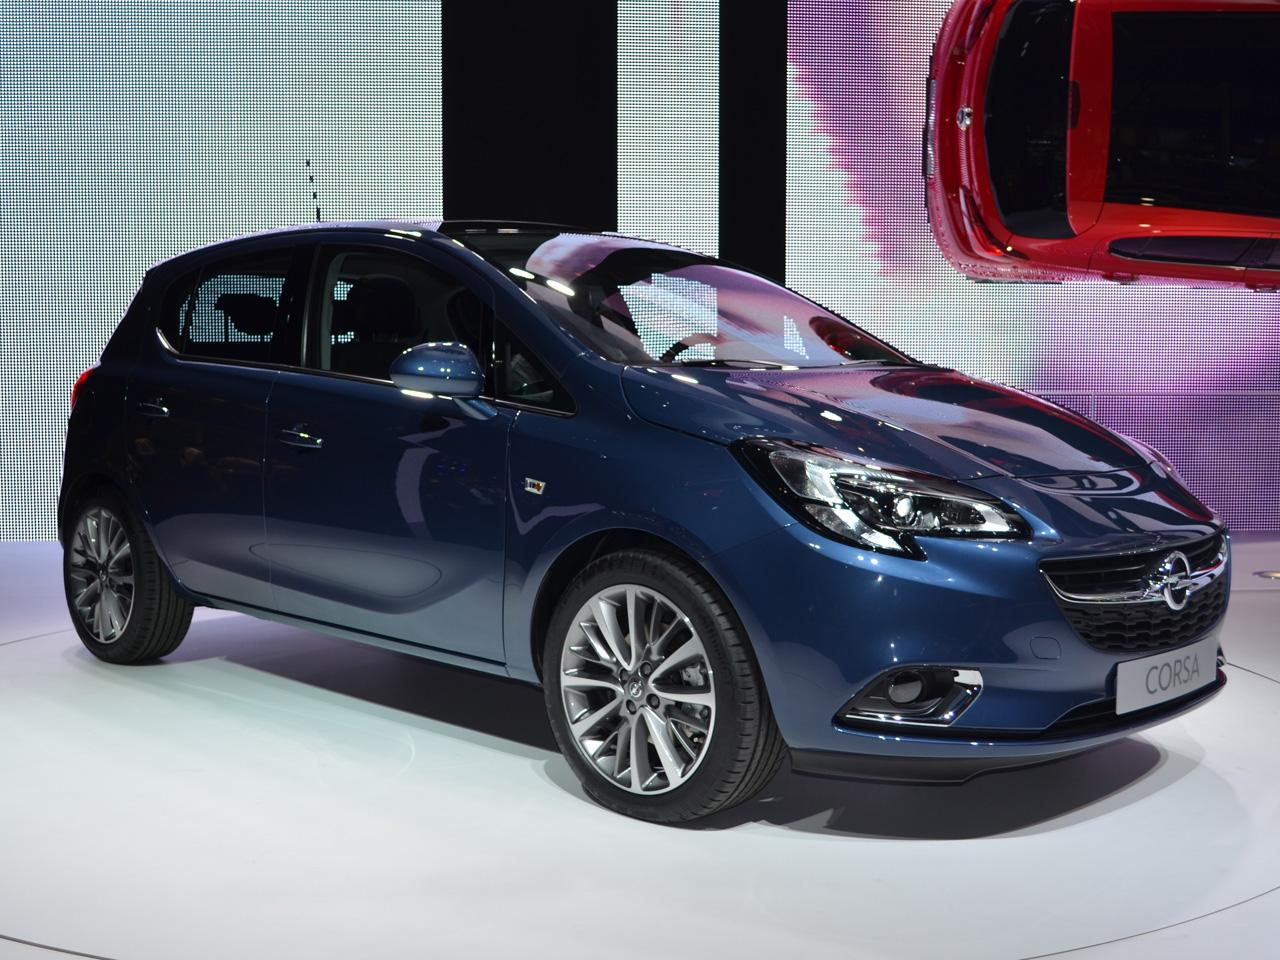 Opel Corsa E 2015 Live Bilder Vom Pariser Autosalon